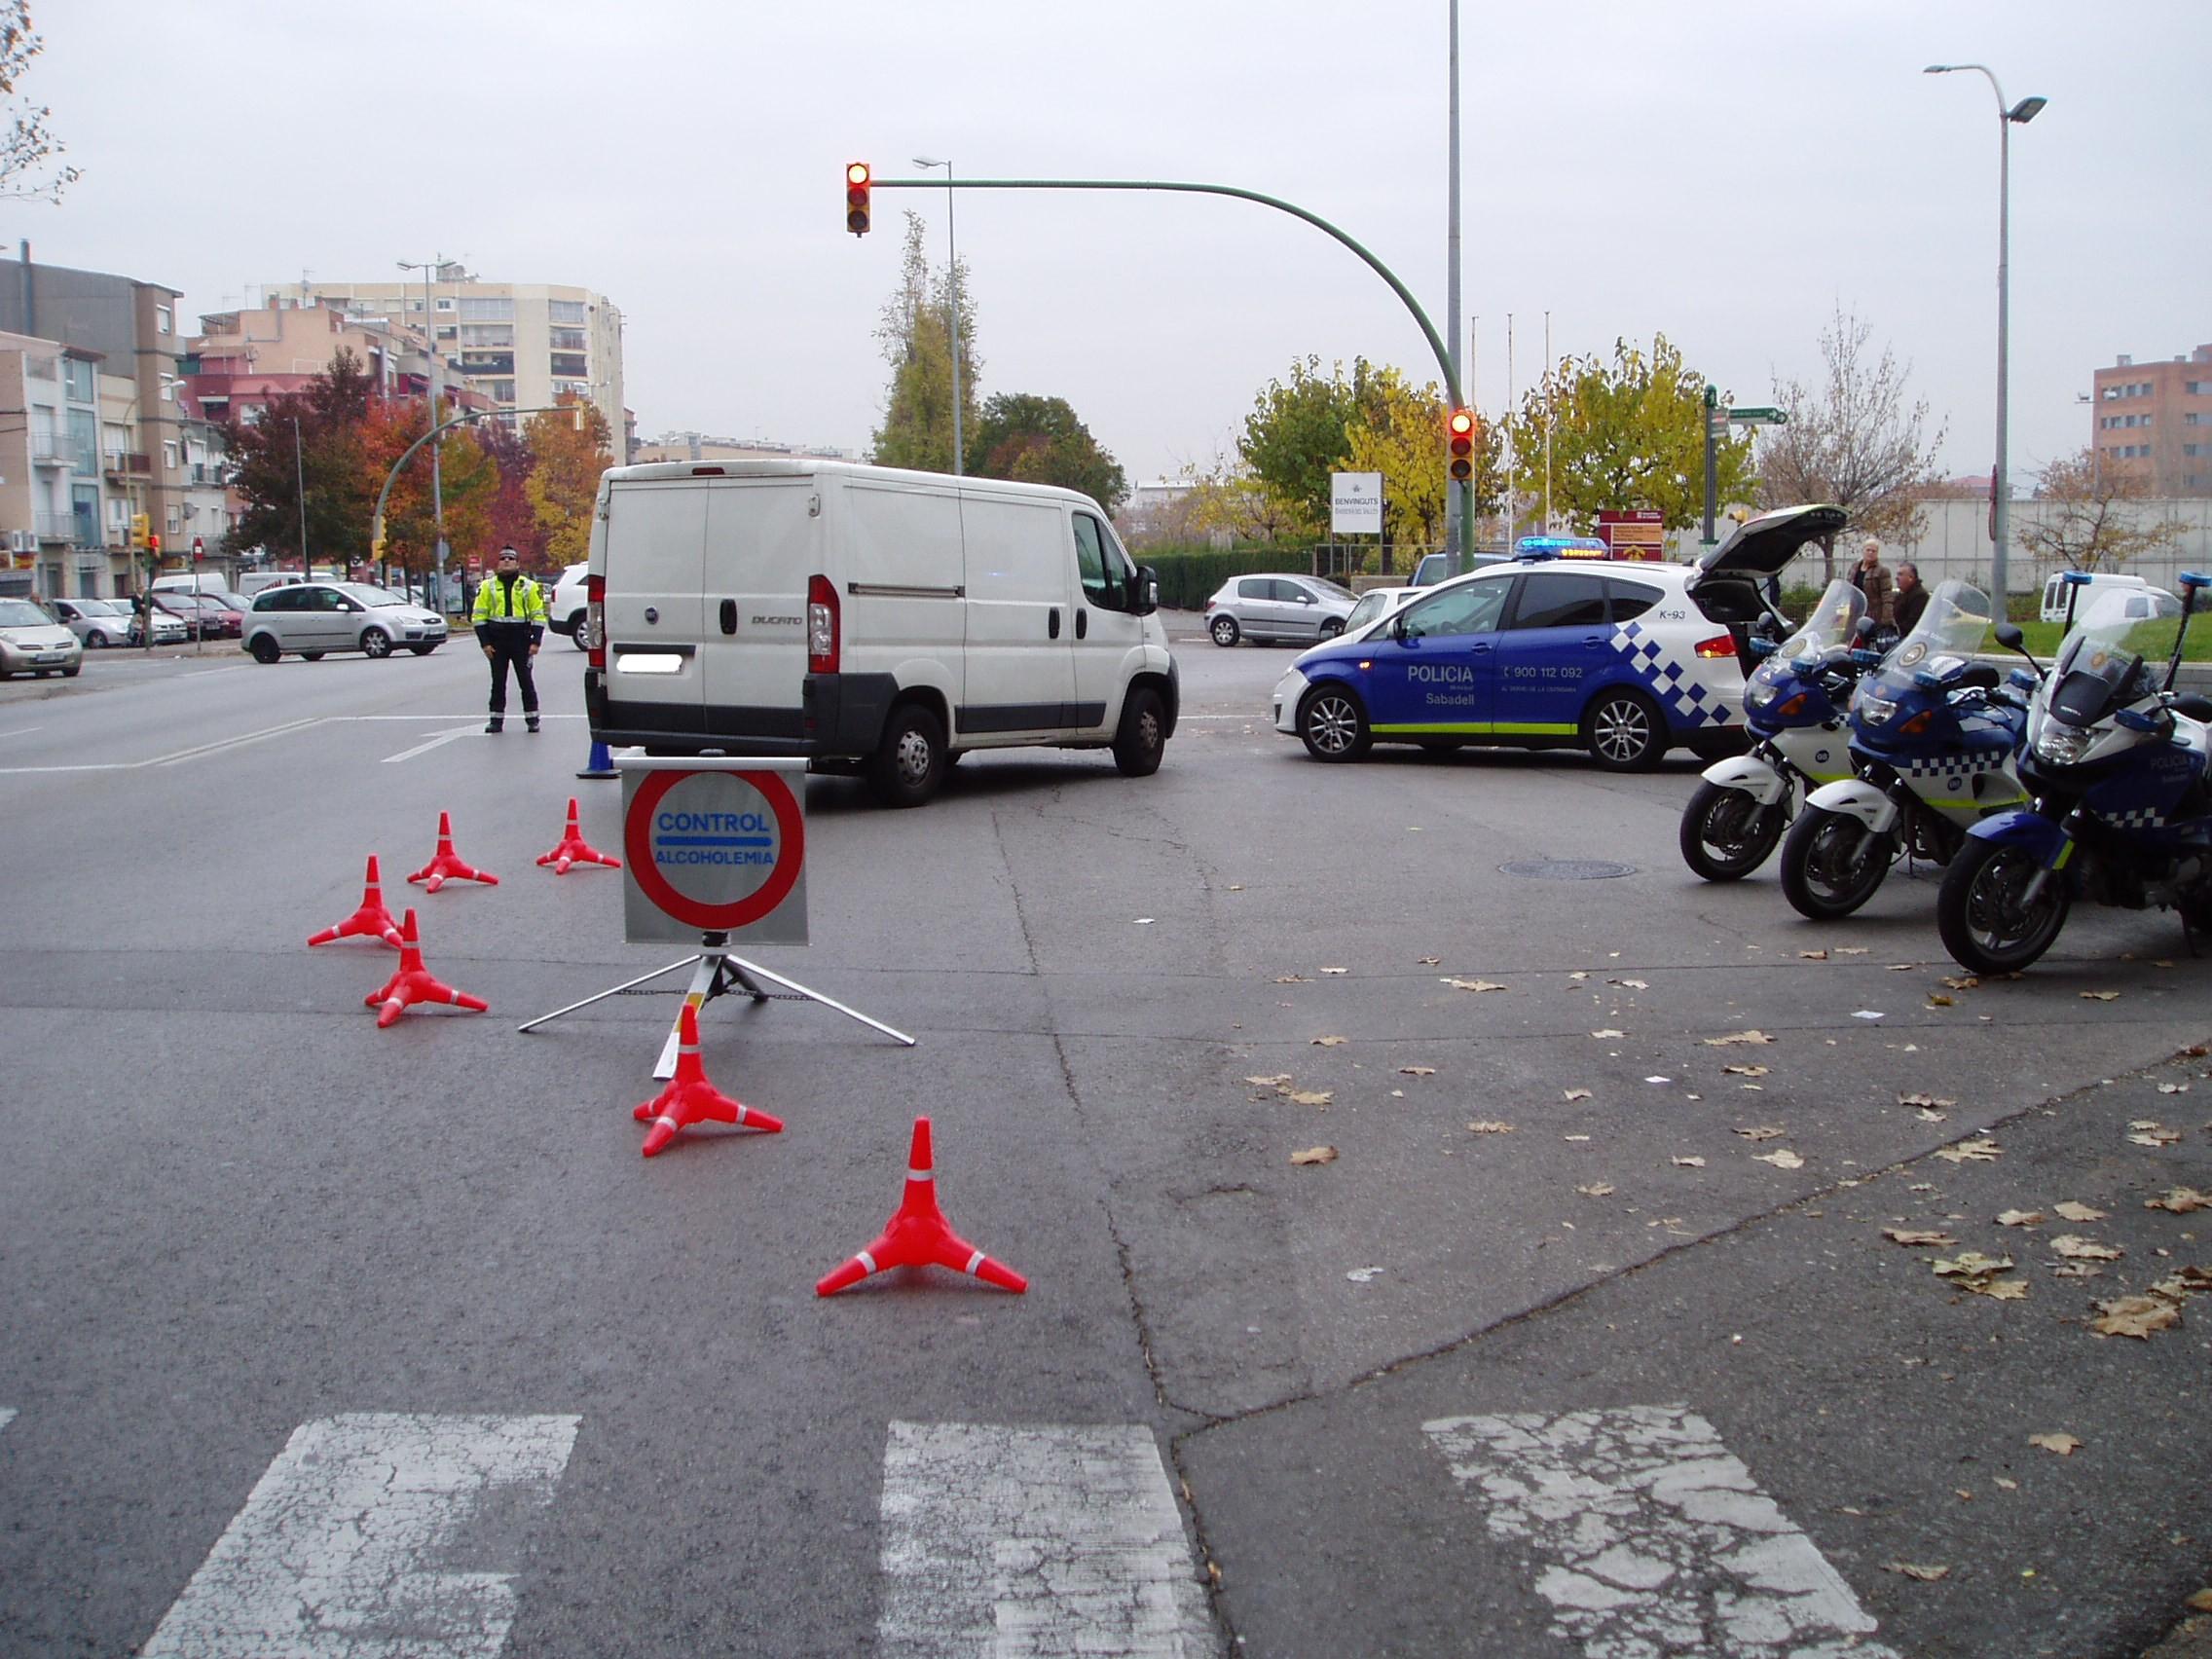 Control de la Policia Local de Sabadell (Foto: PremsaSabadell / Wikimedia Commons)